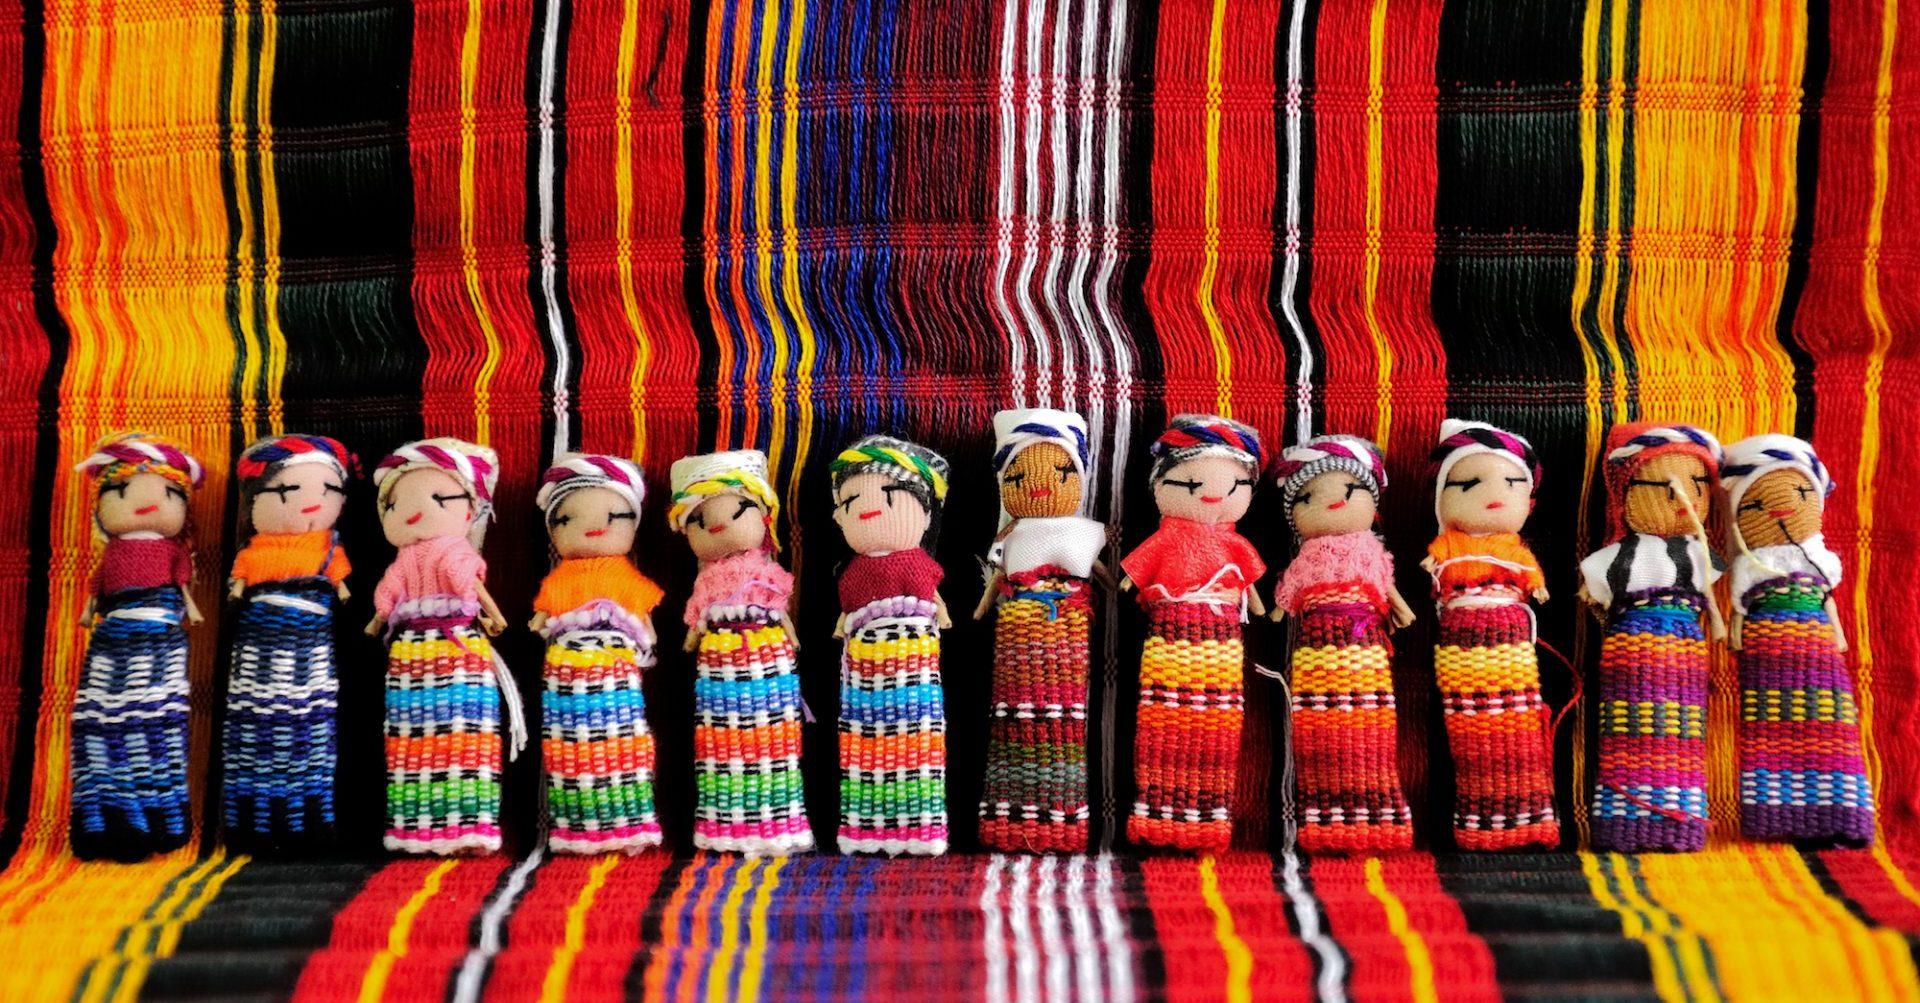 Guatemala, Kunsthandwerk, bunte Stoffe, Reisen